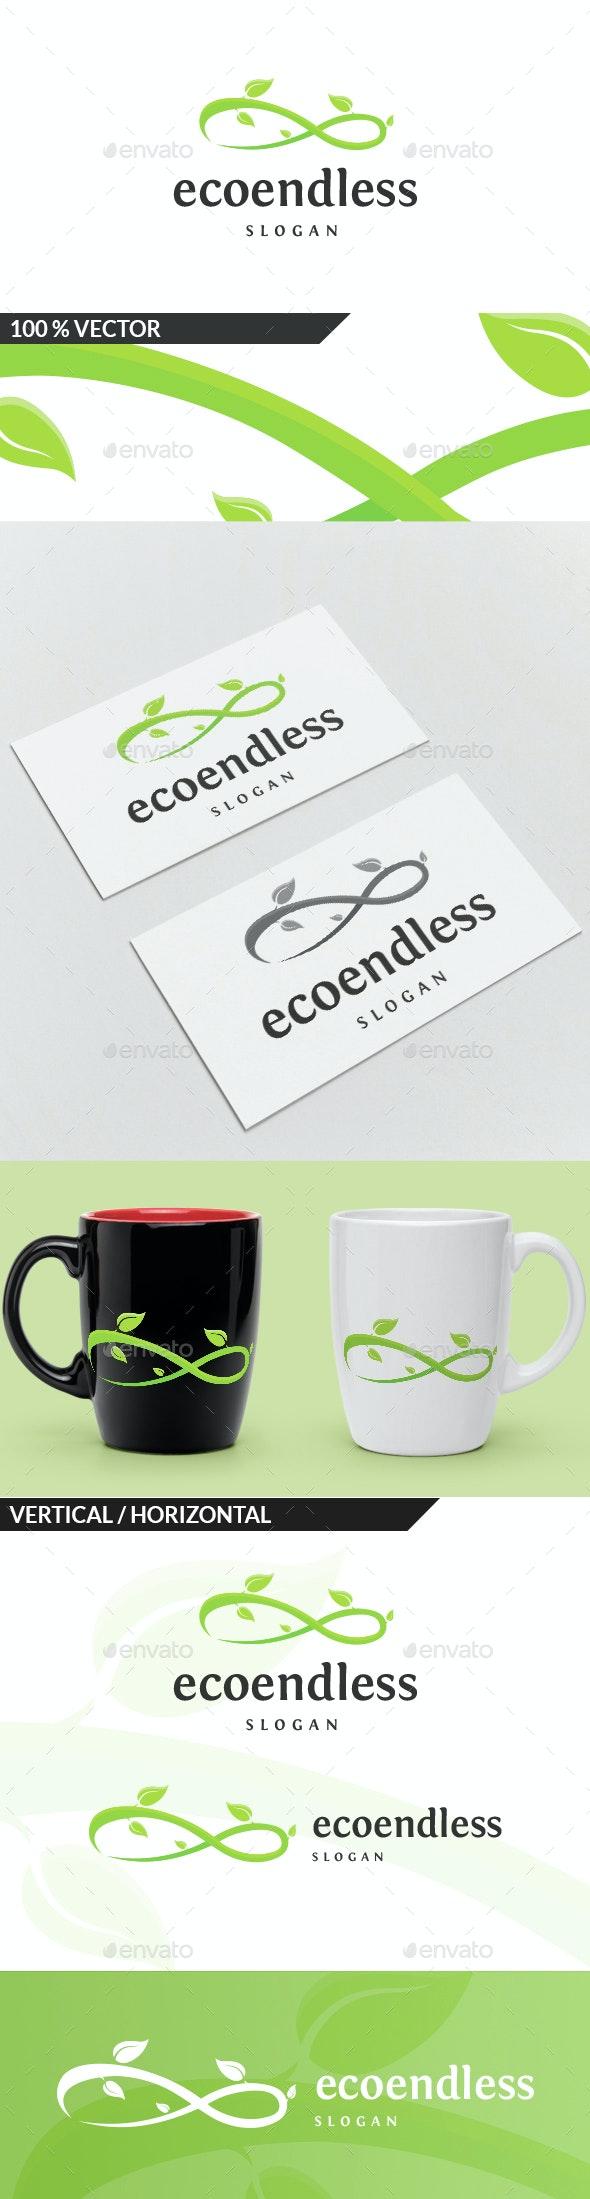 Eco Endless Logo - Nature Logo Templates